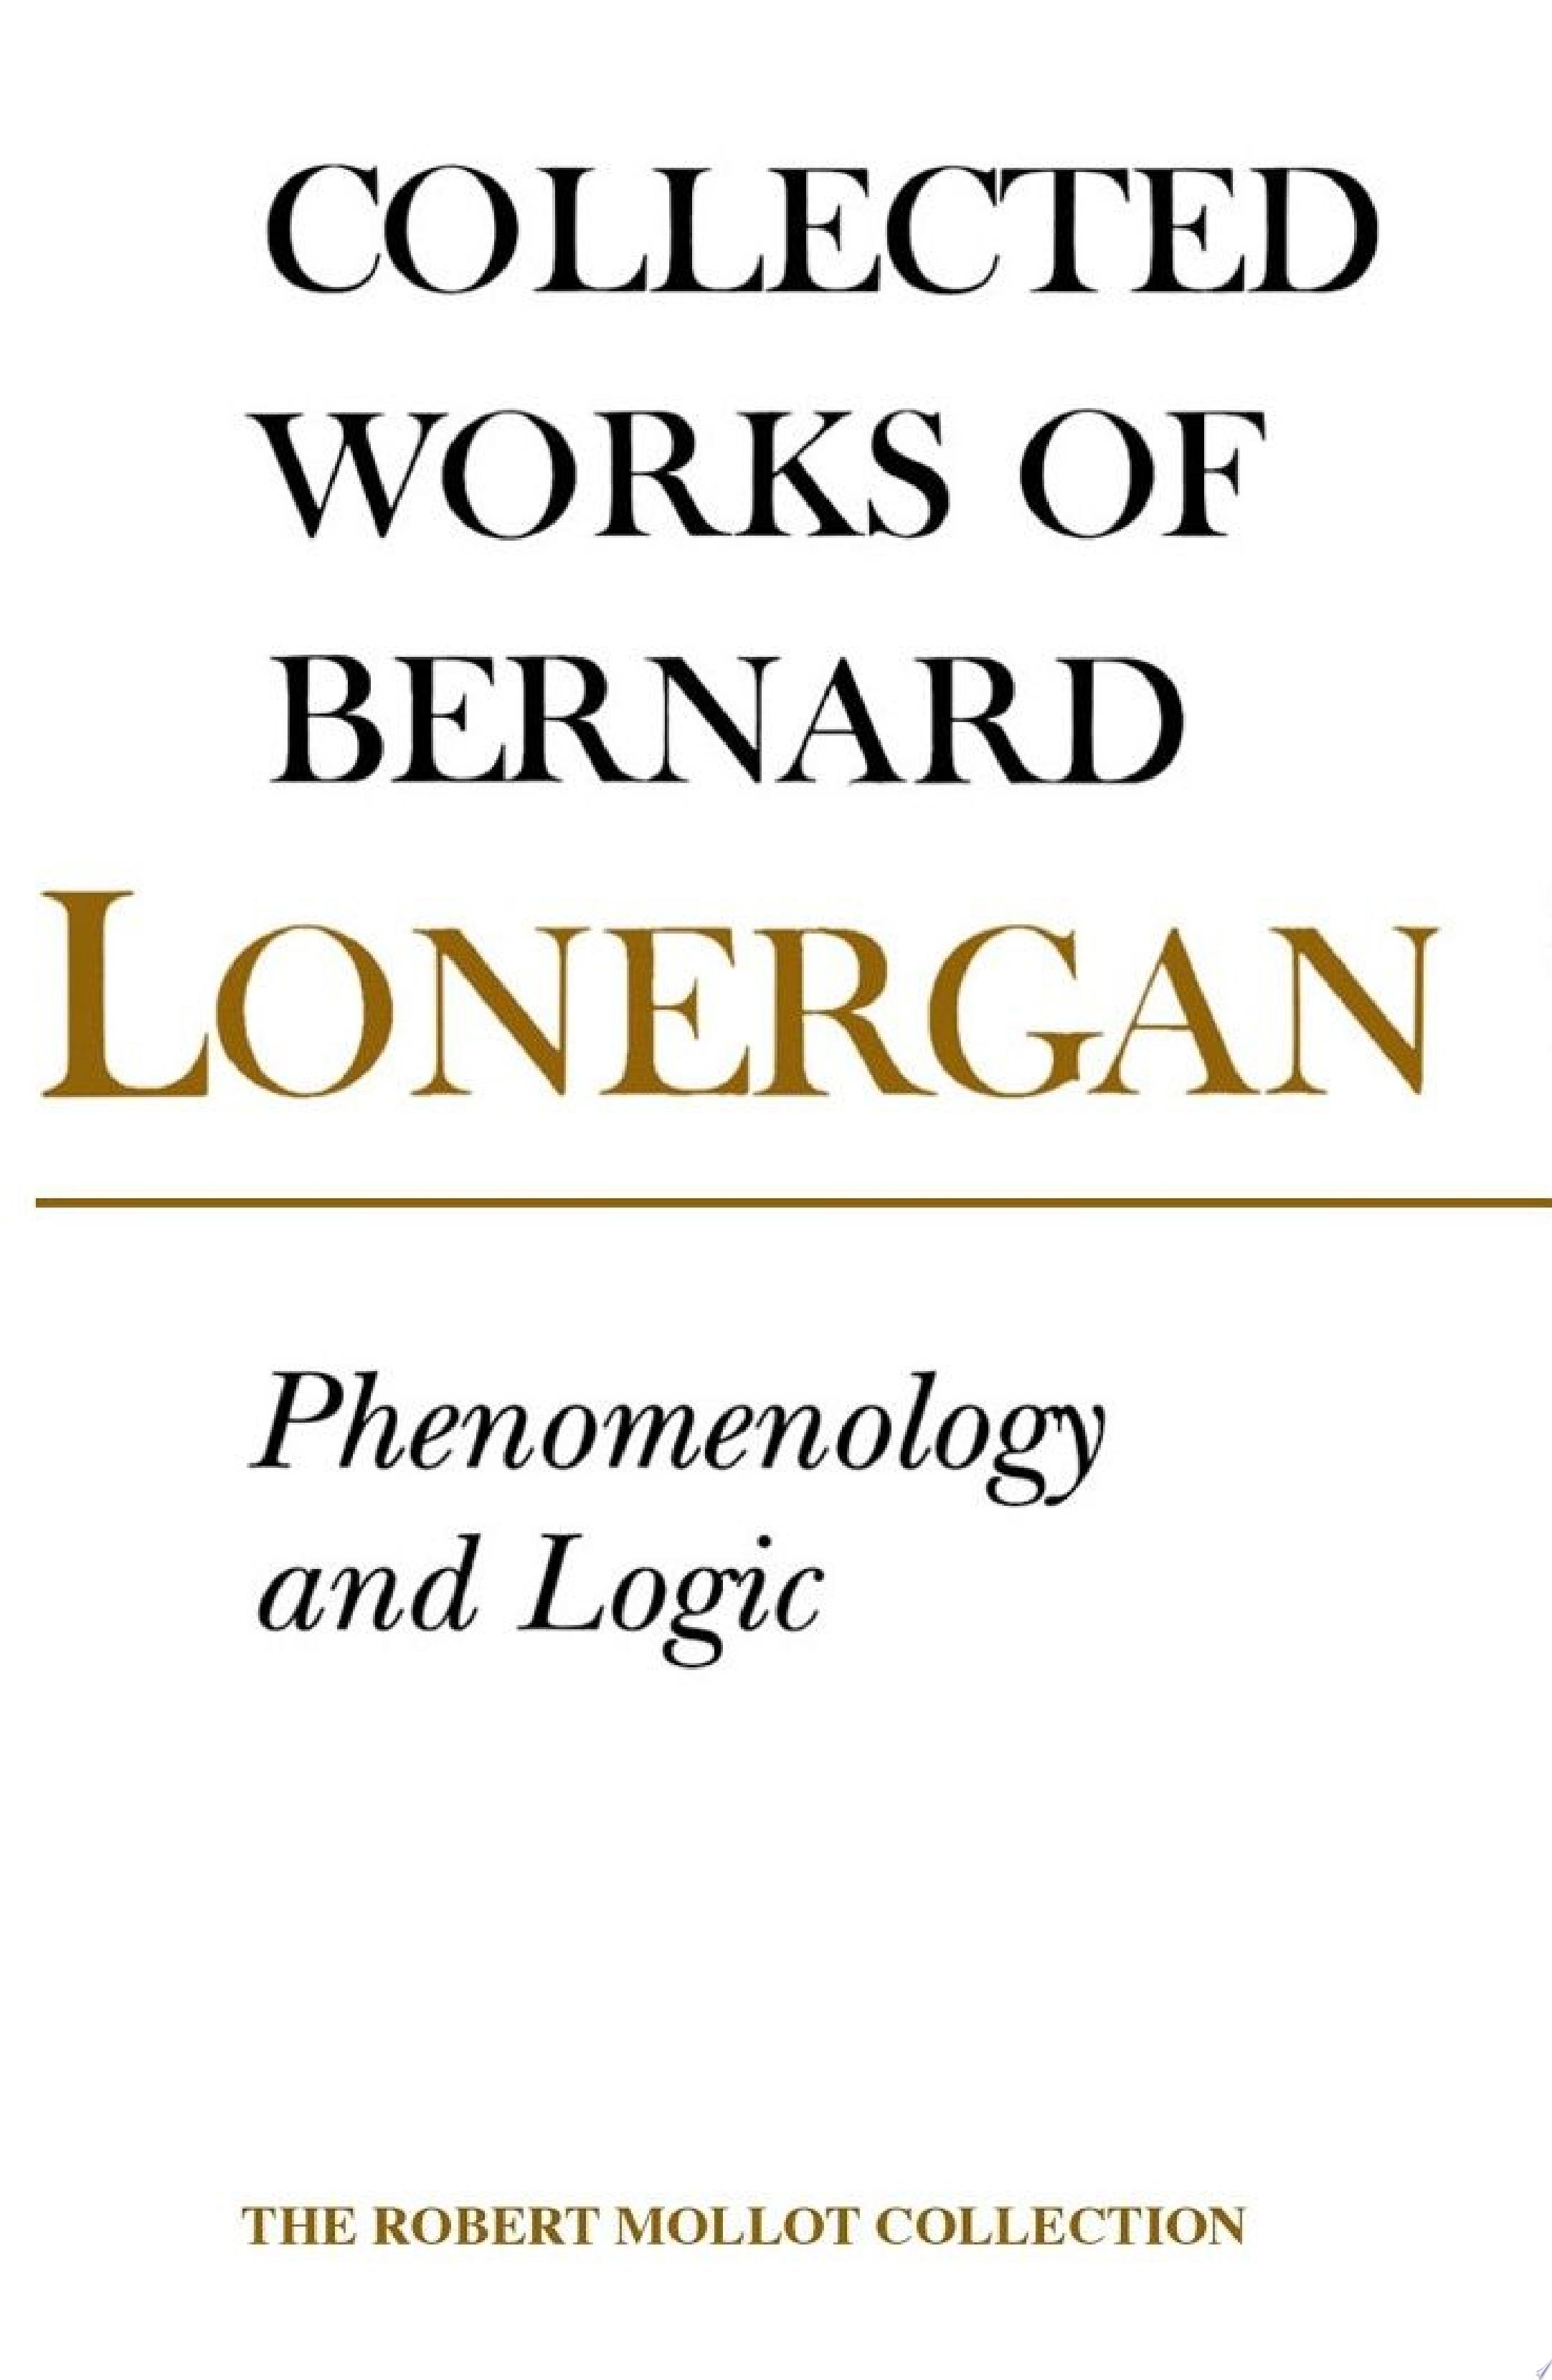 Phenomenology and Logic